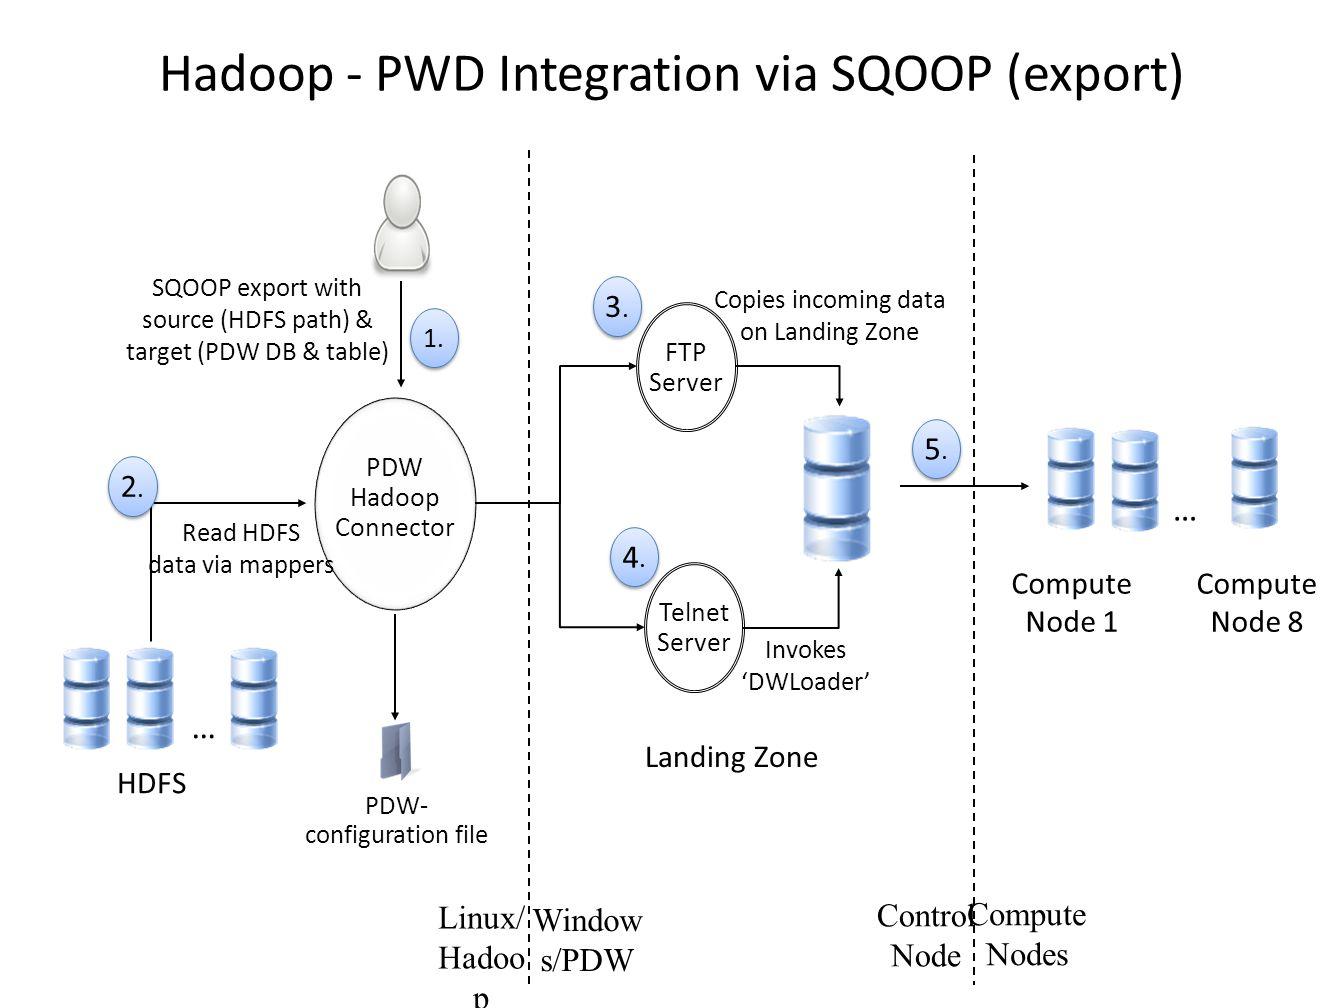 Hadoop - PWD Integration via SQOOP (export) … Landing Zone Compute Node 1 Compute Node 8 HDFS … PDW- configuration file PDW Hadoop Connector SQOOP export with source (HDFS path) & target (PDW DB & table) 1.